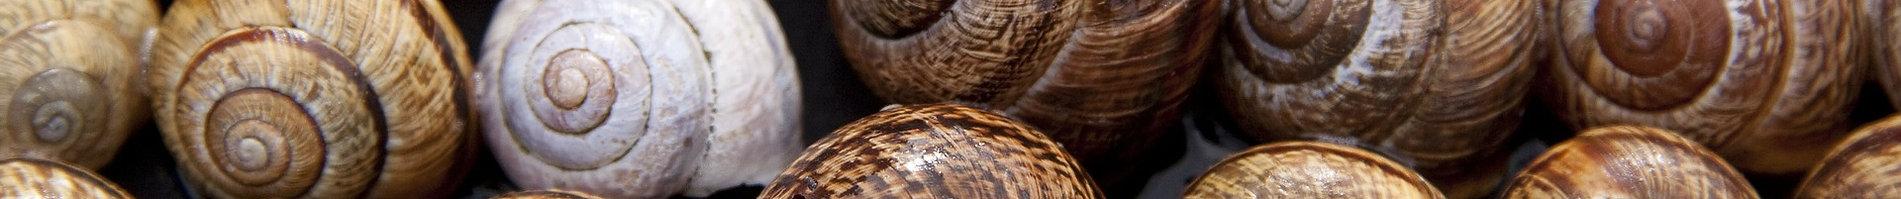 snail-shells-65358_1920.jpg